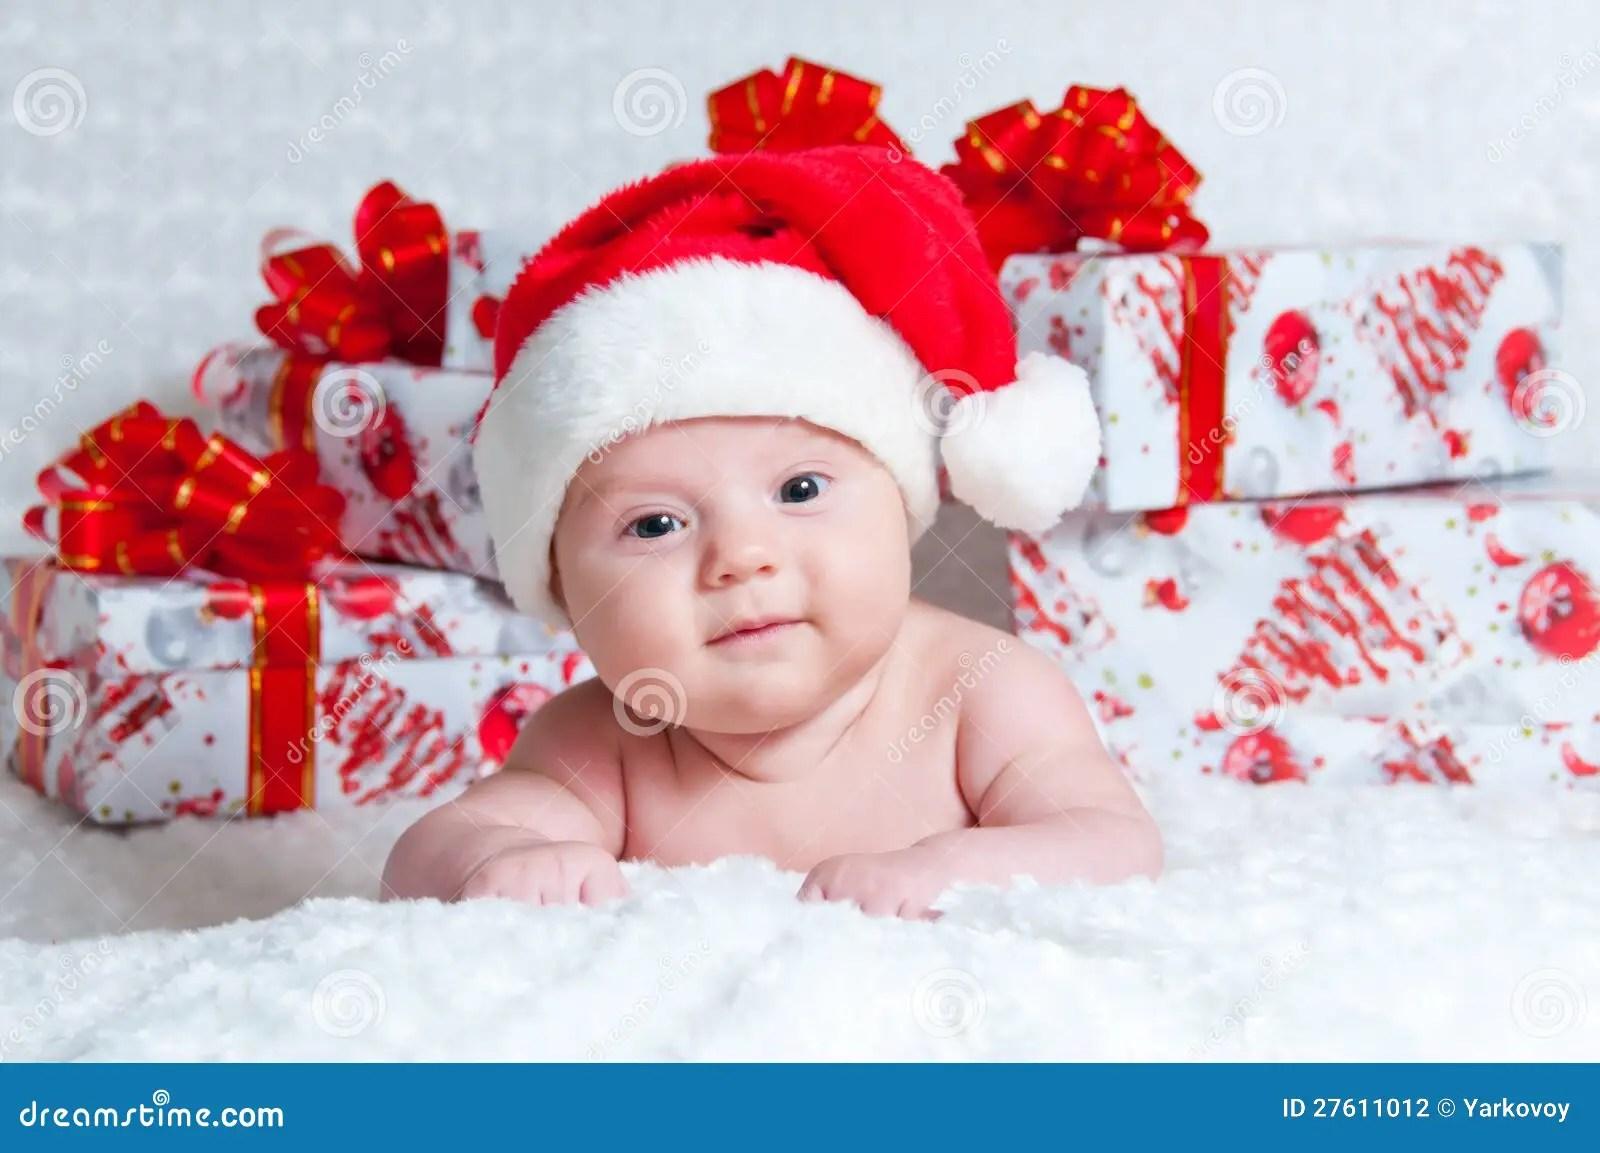 Holiday Ideas Portrait Newborn